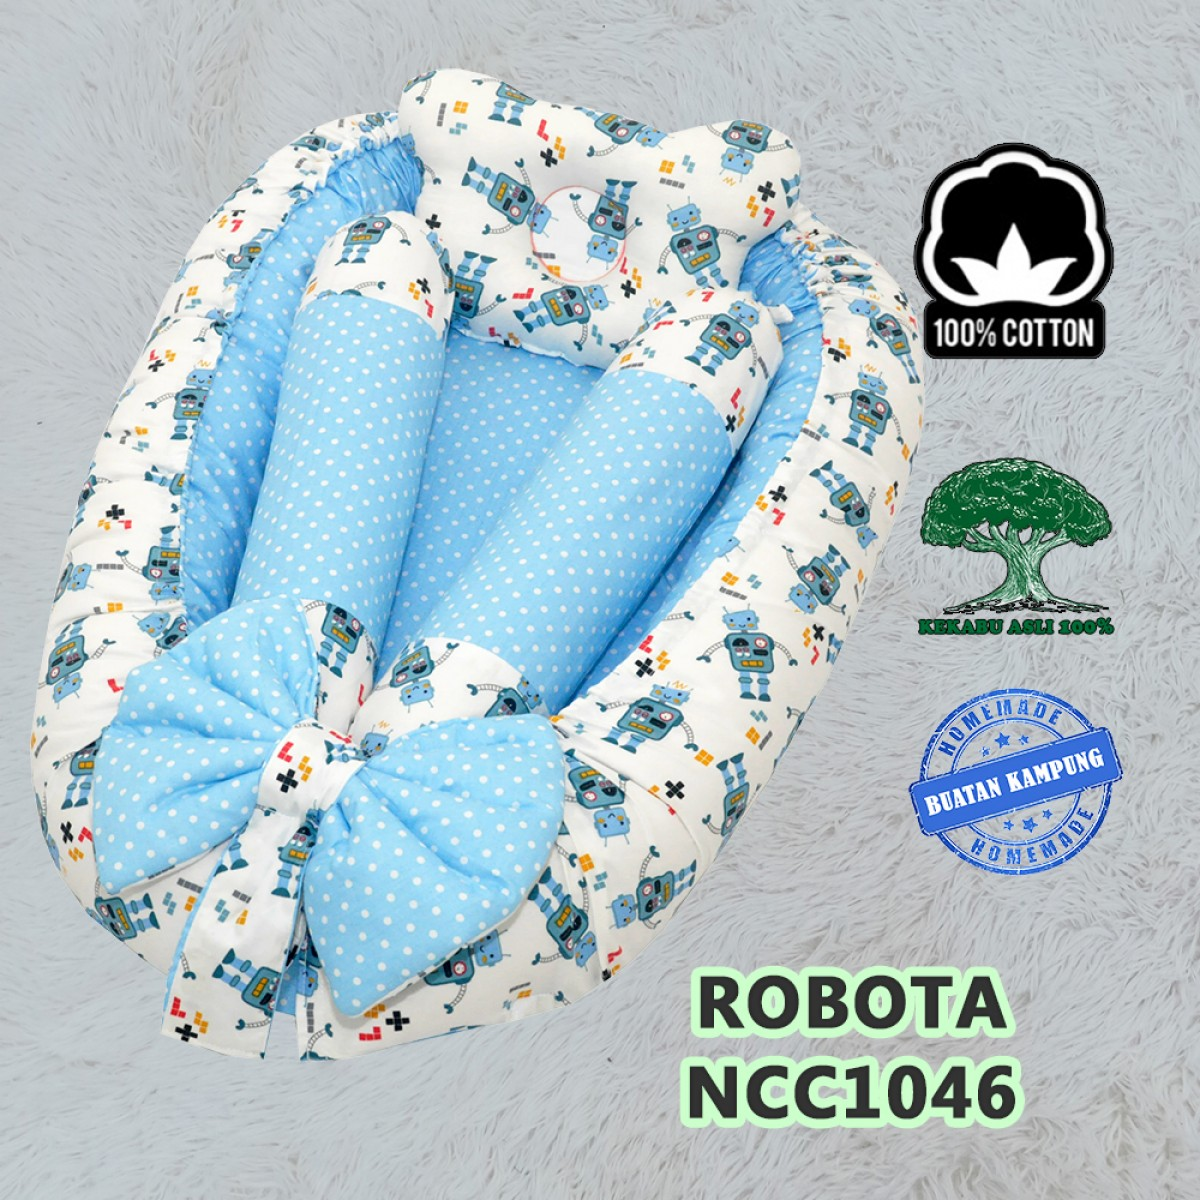 Robota - Kico Baby Center